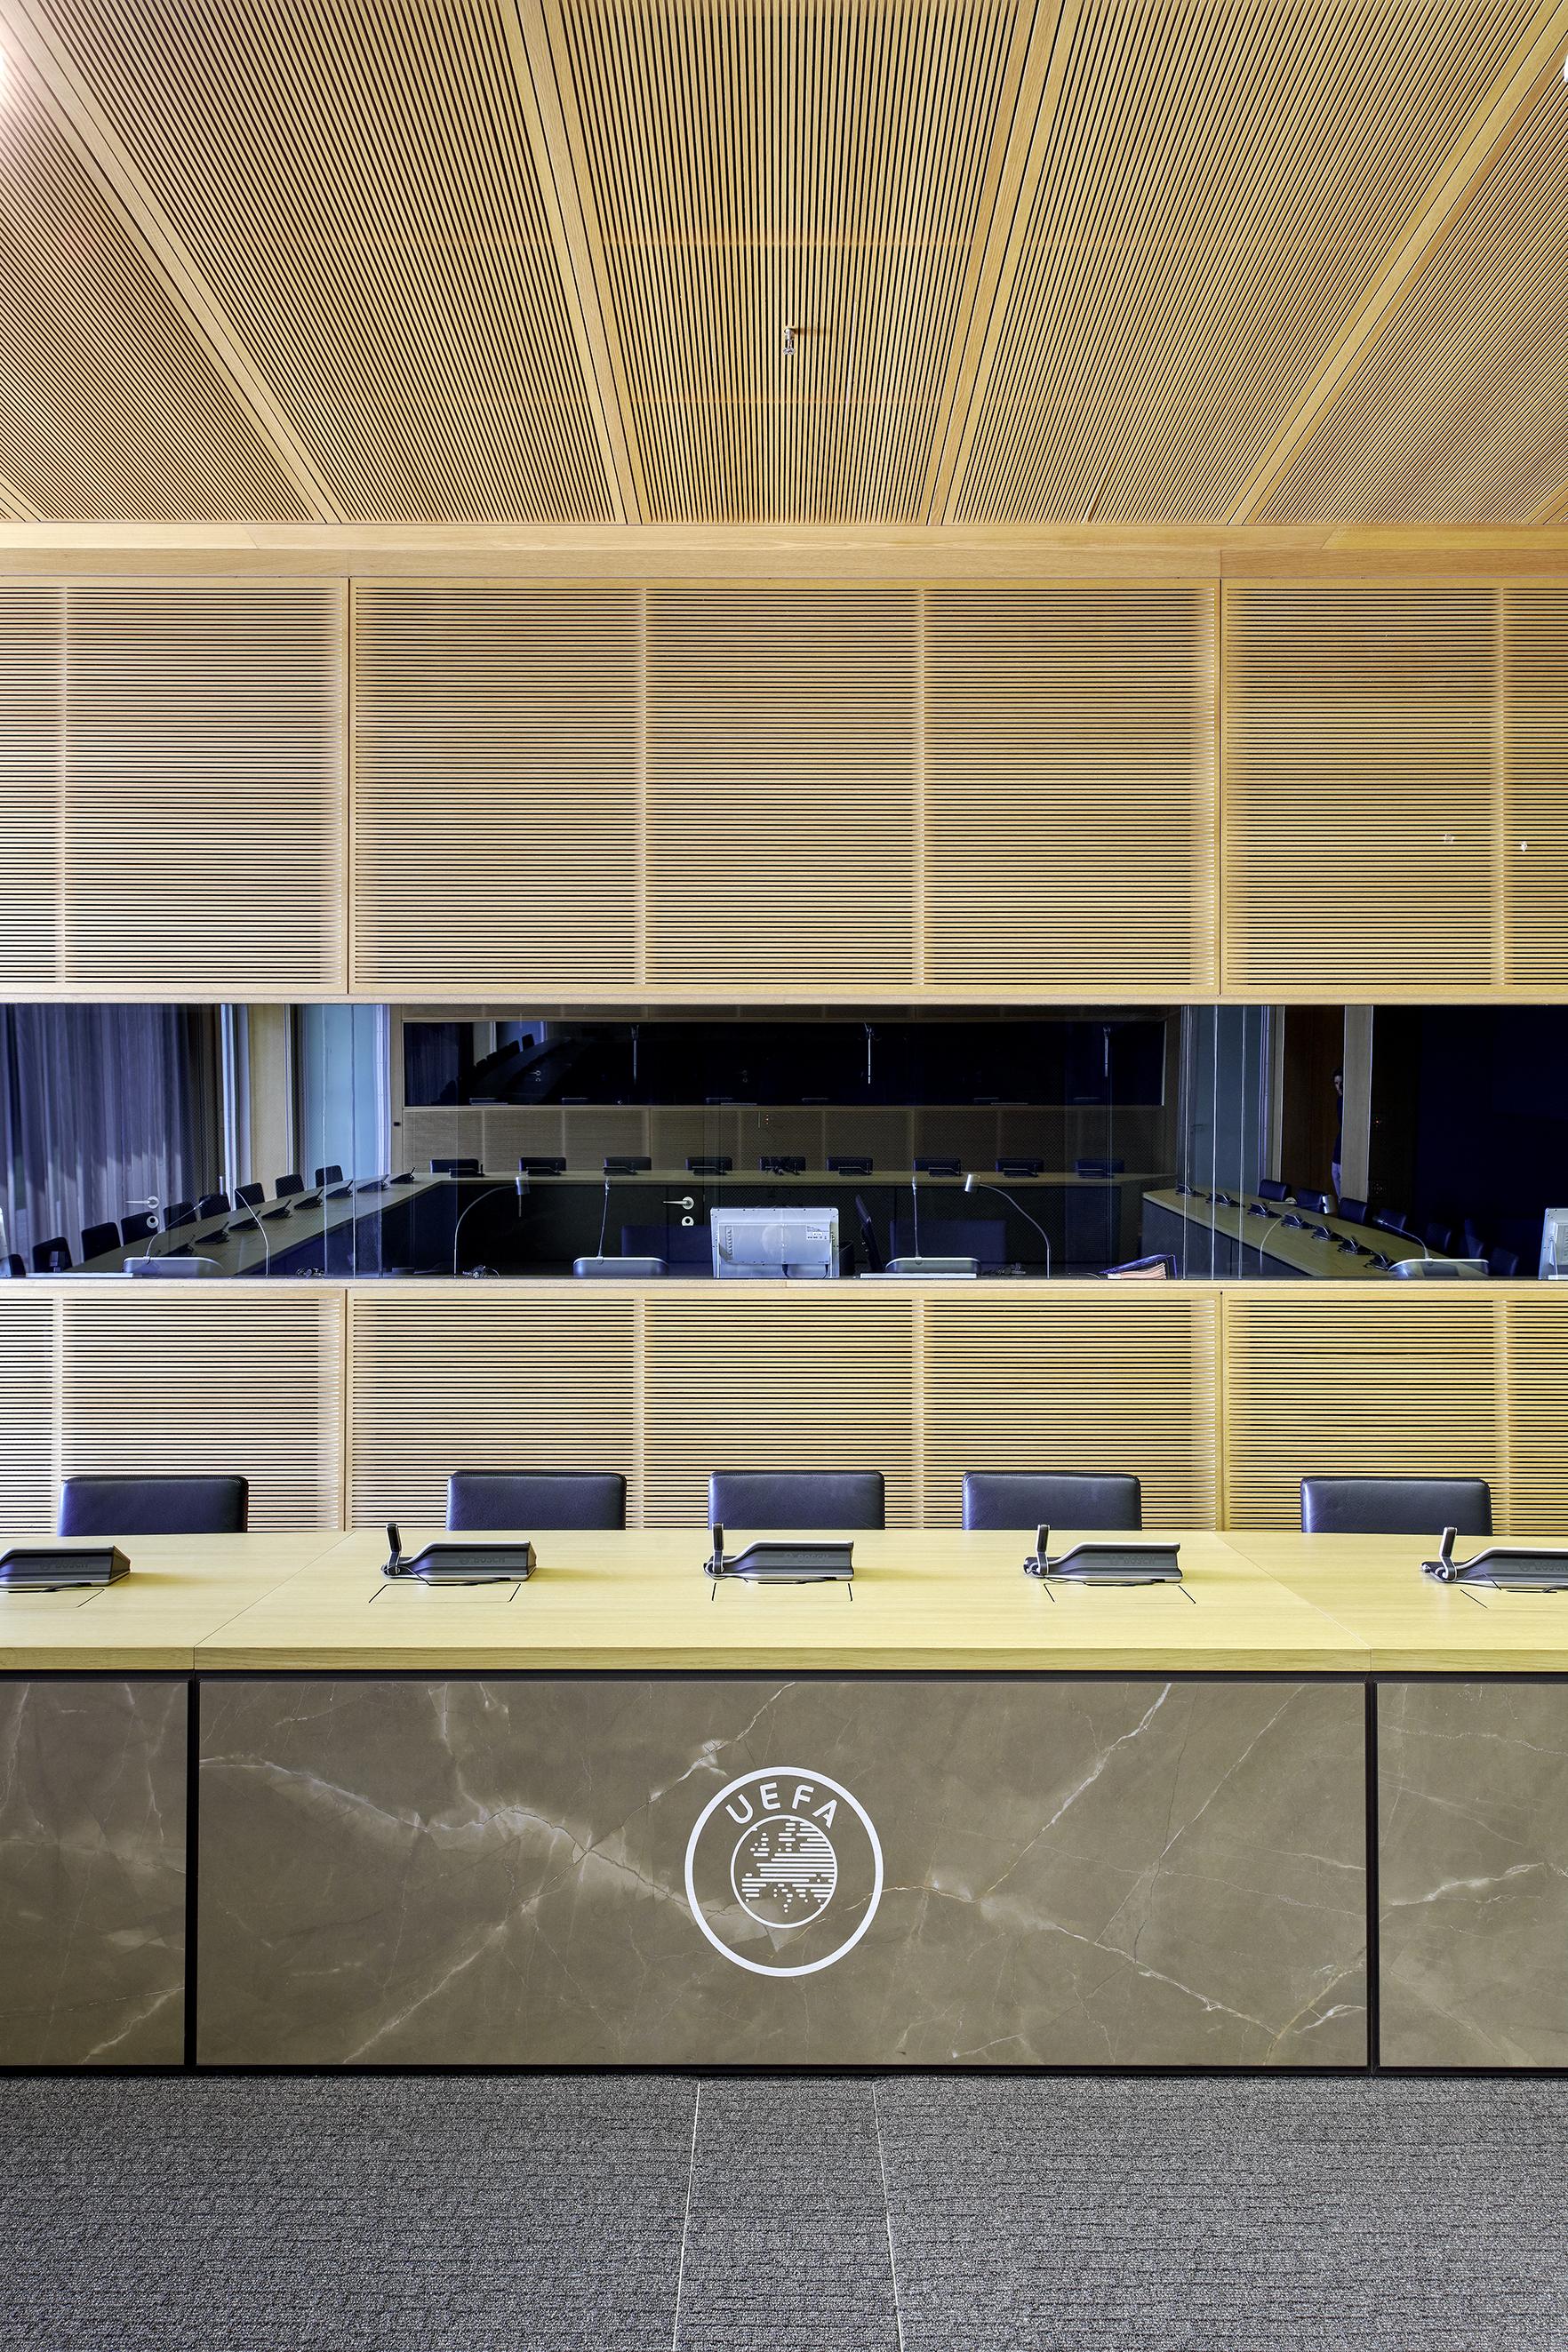 UEFA boardroom 2